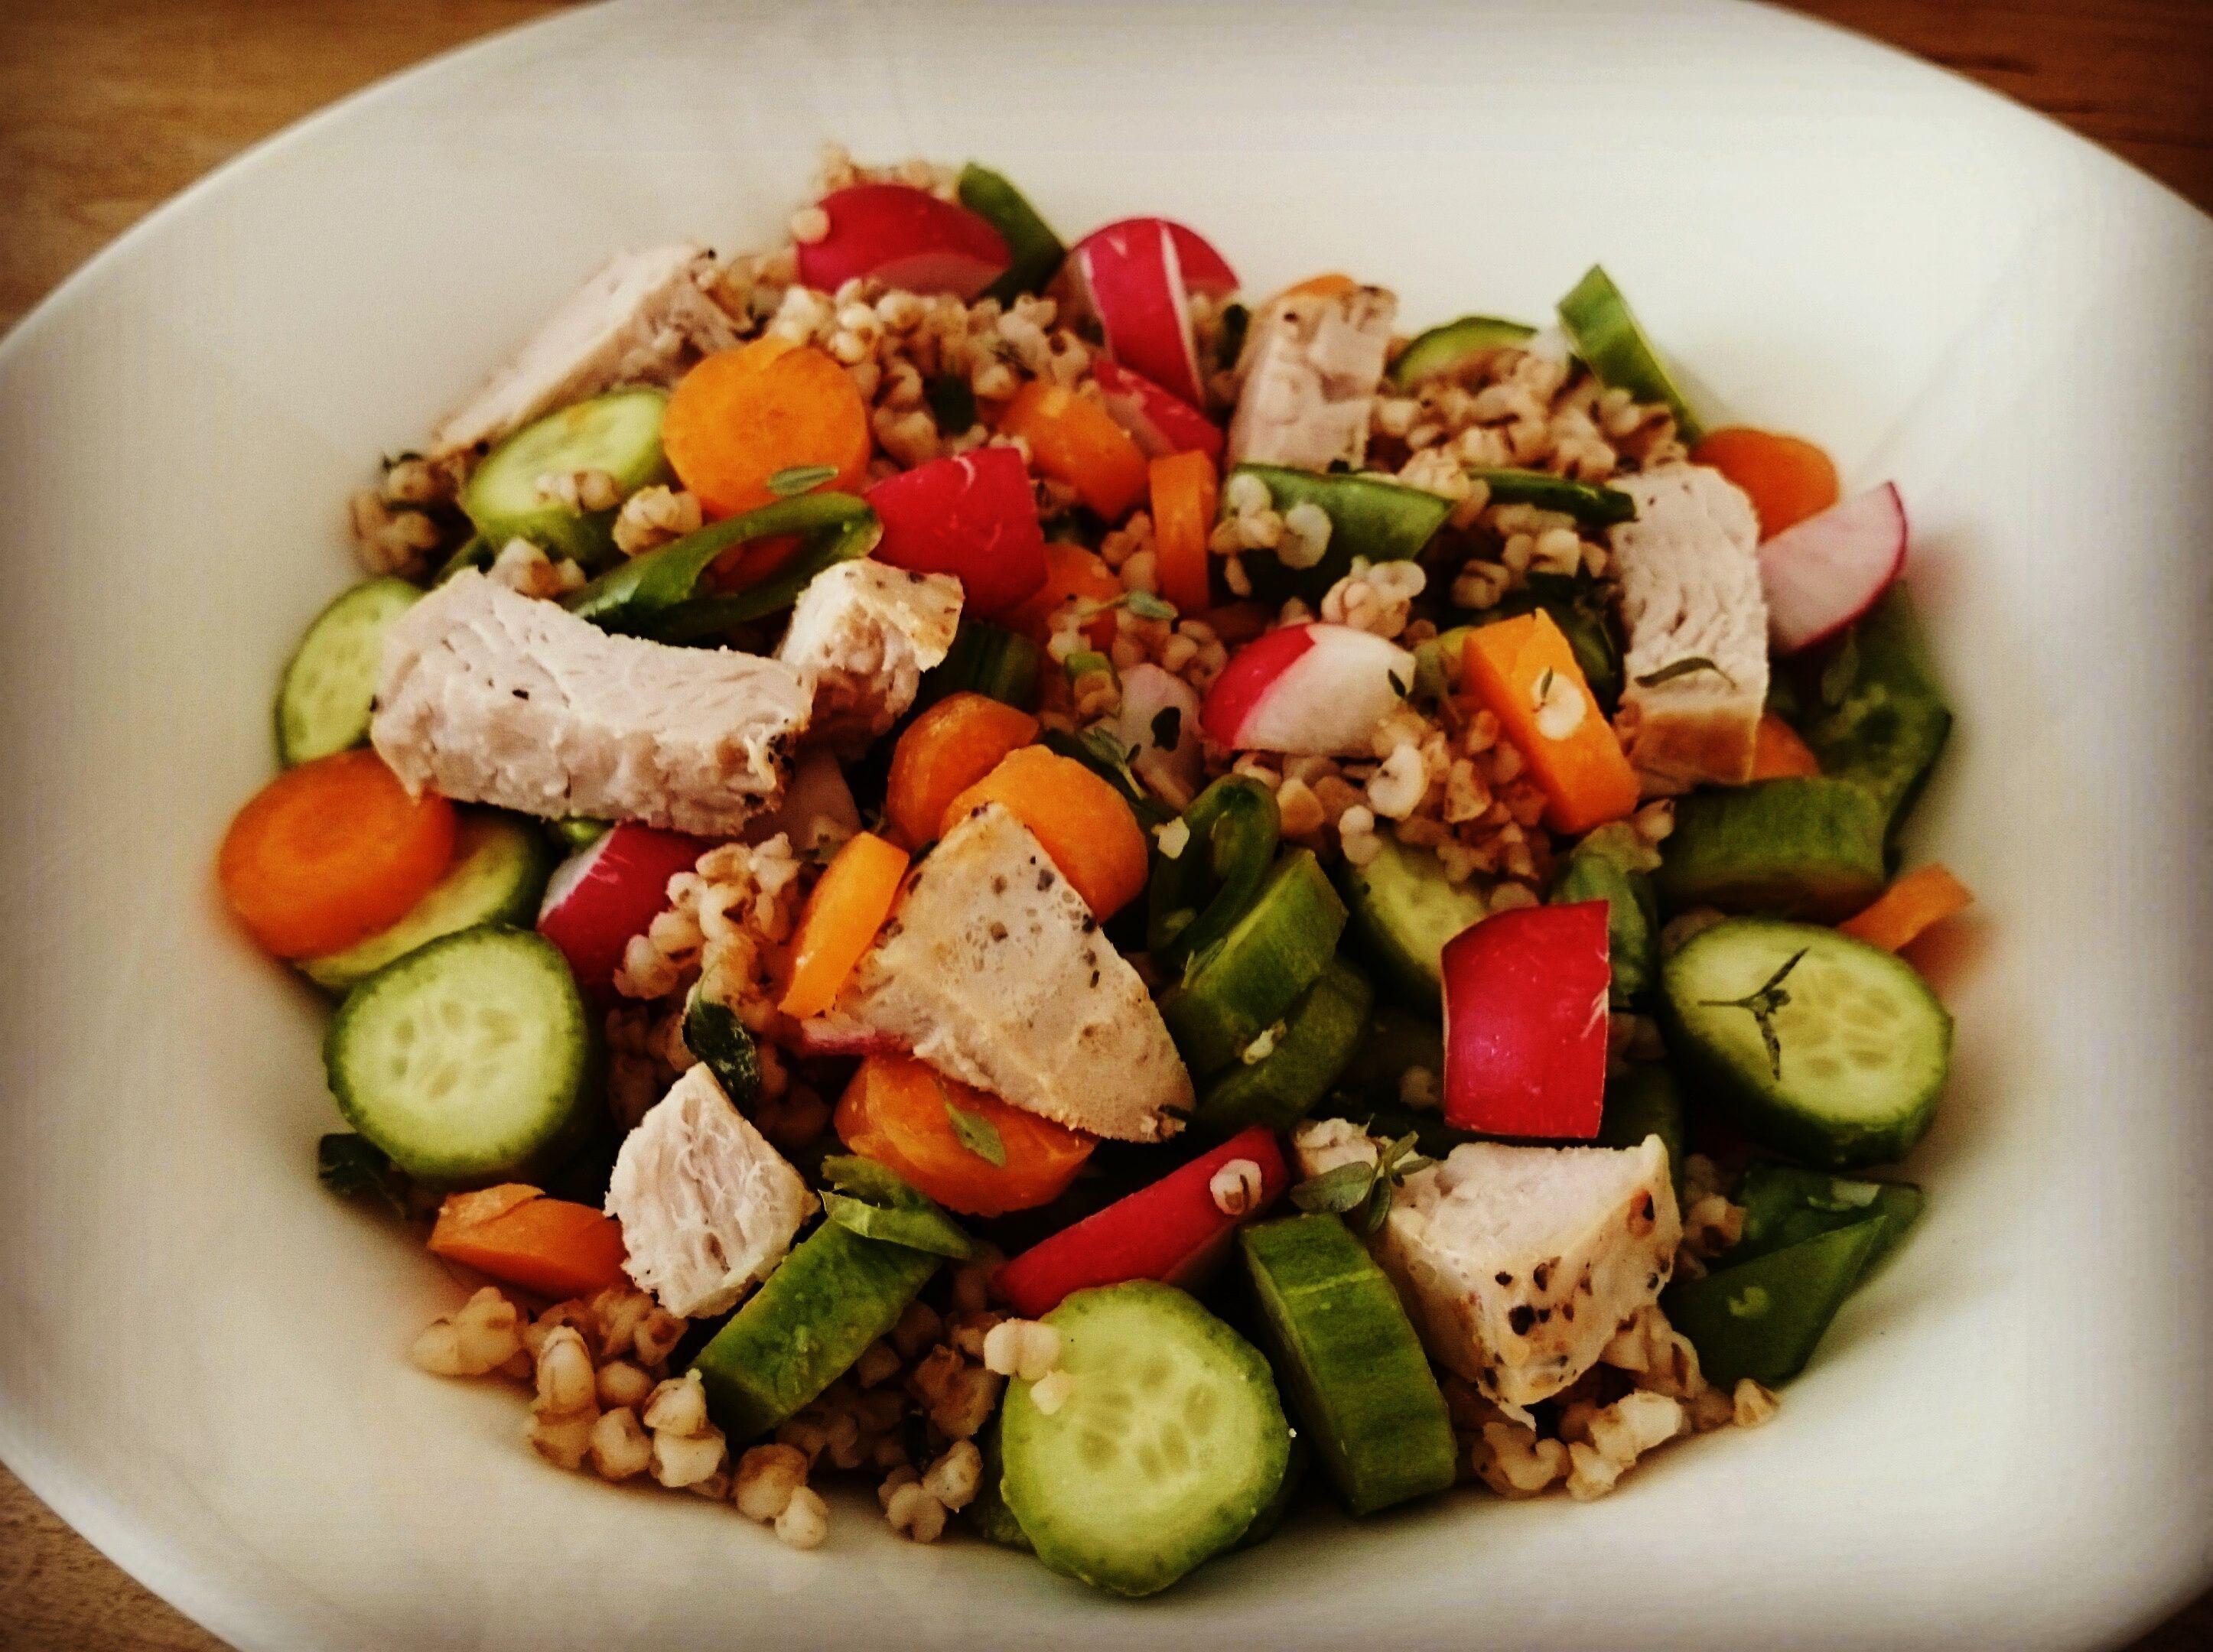 Barley, turkey breast, summer veggies to replace a pasta salad ...